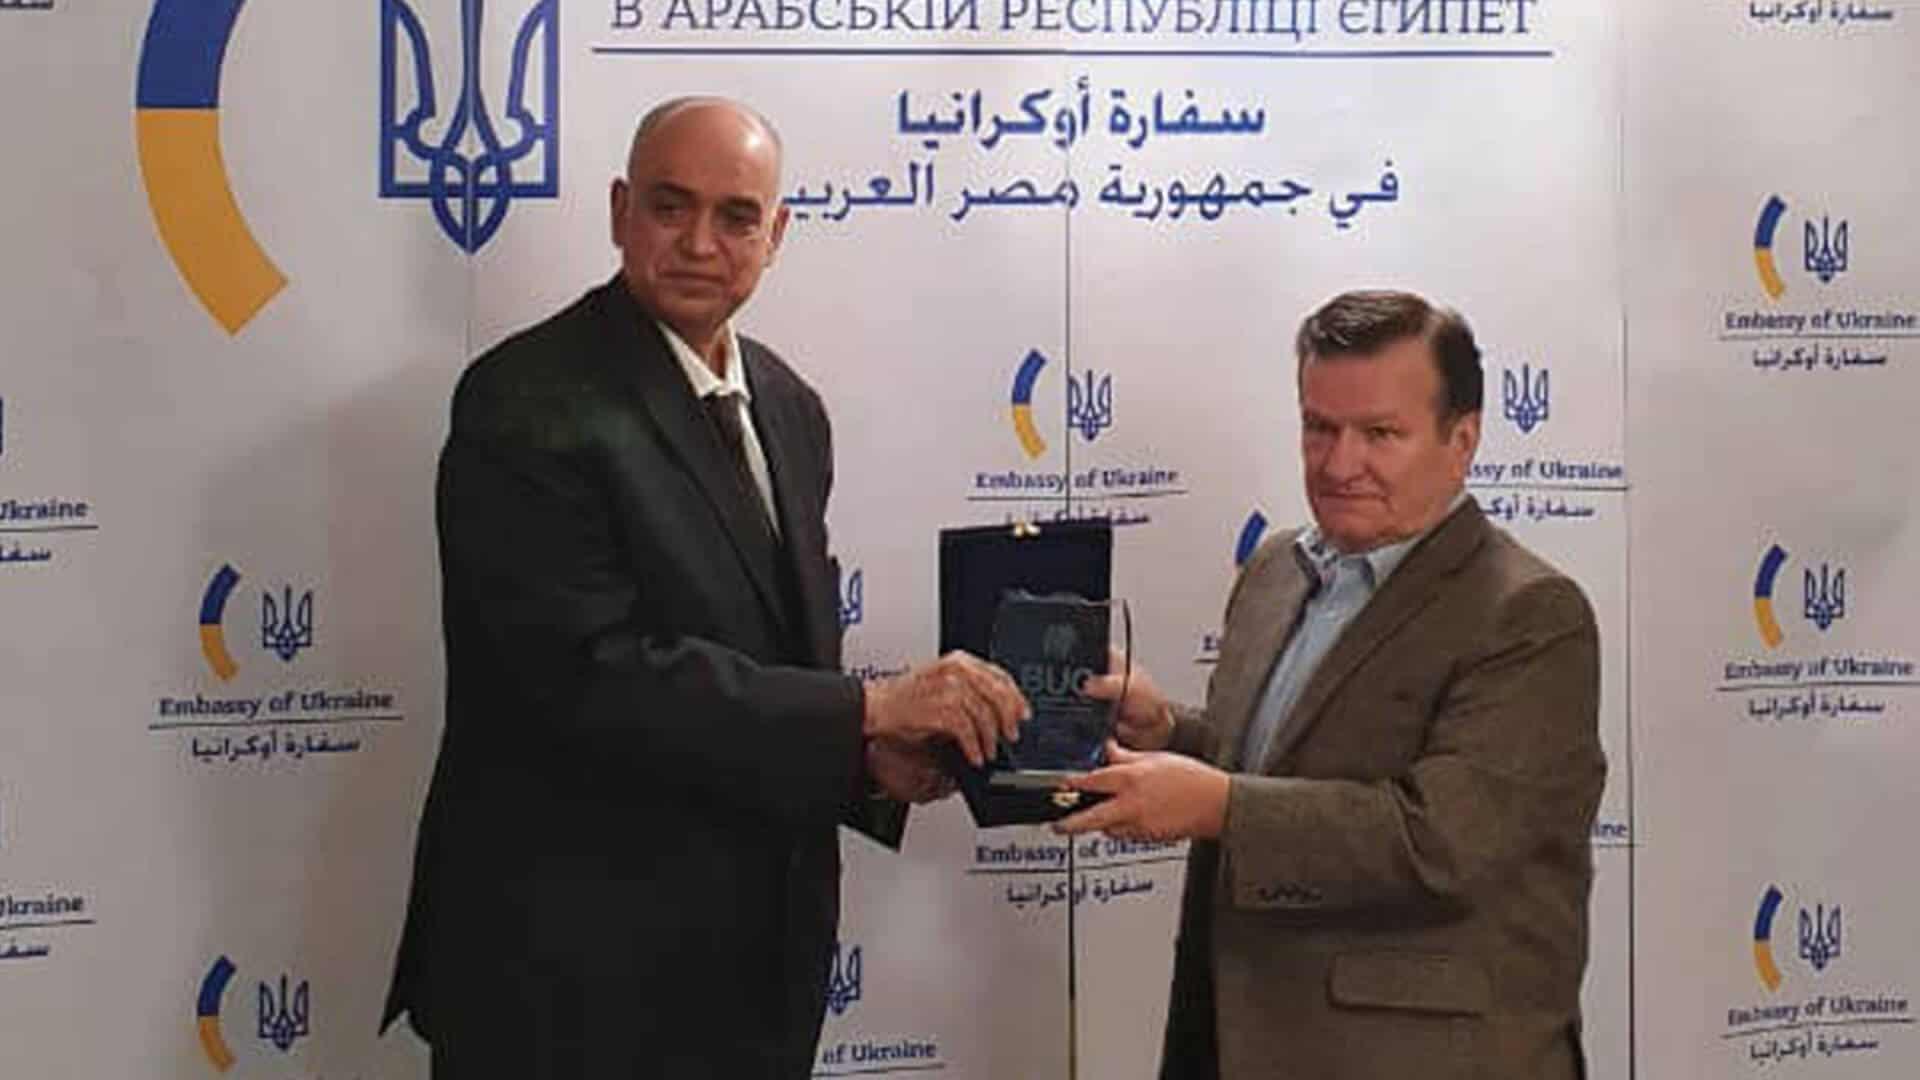 BUC - News - Cooperation Protocol Between the Ukrainian Embassy and BUC - 2